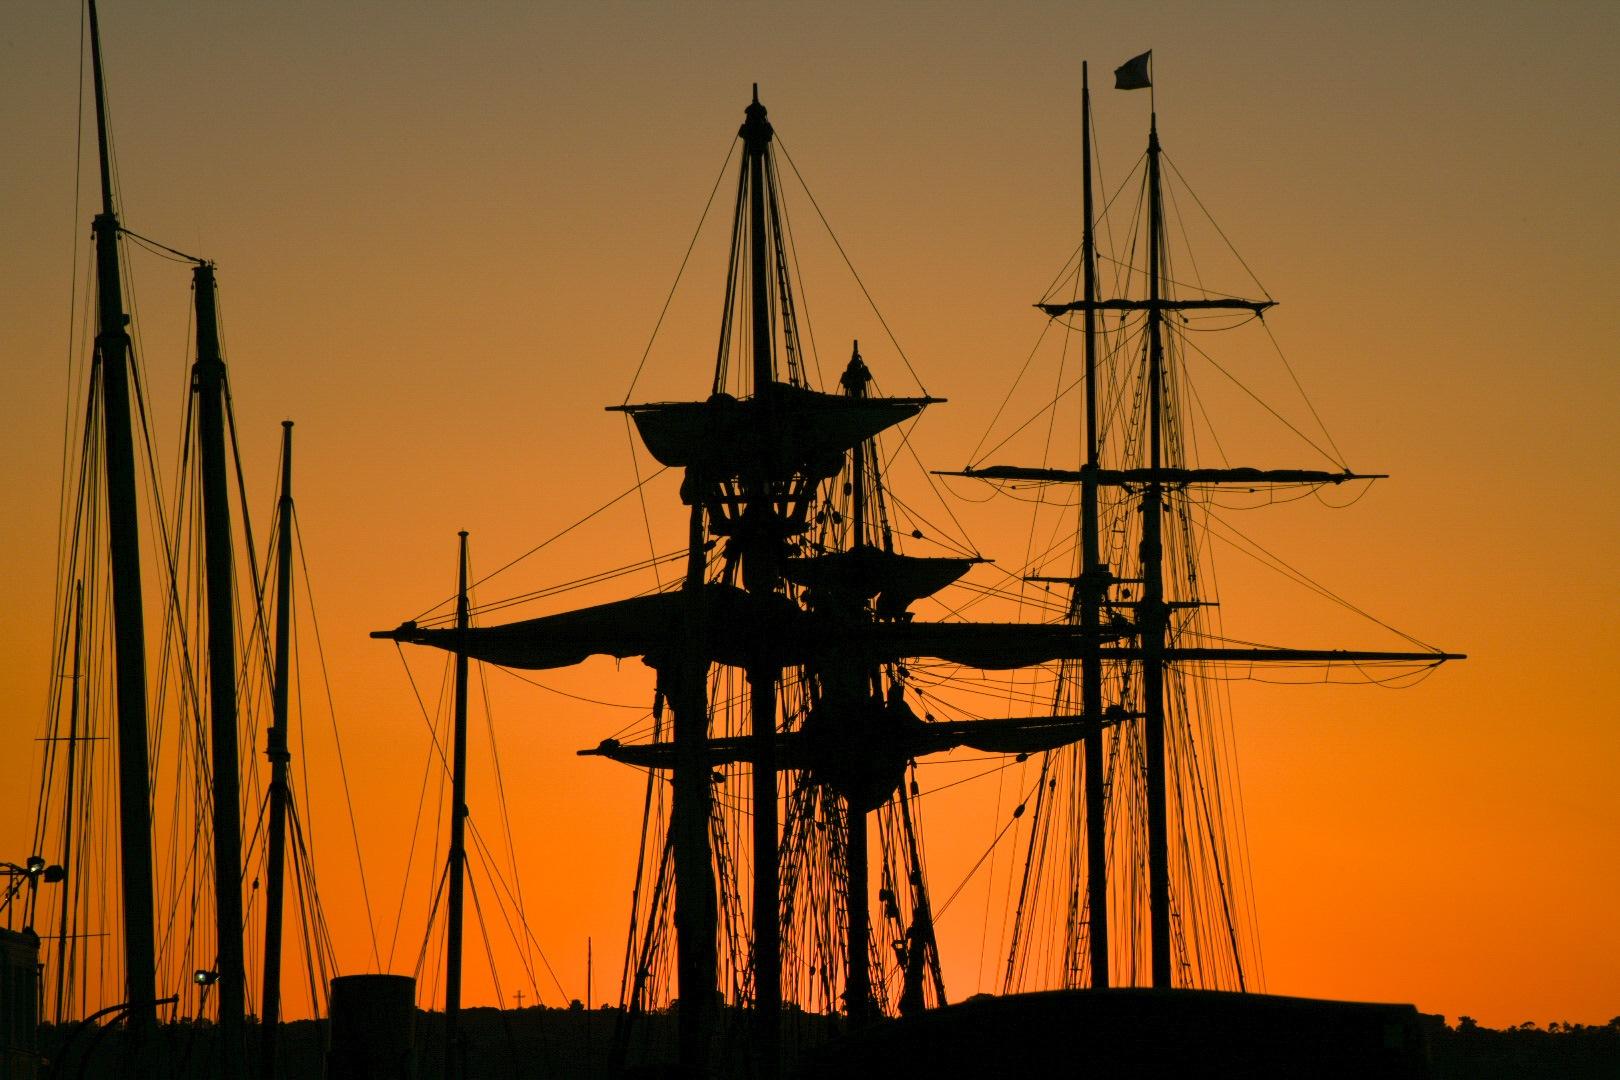 Sunset Masts by Gerard Francis Corbett